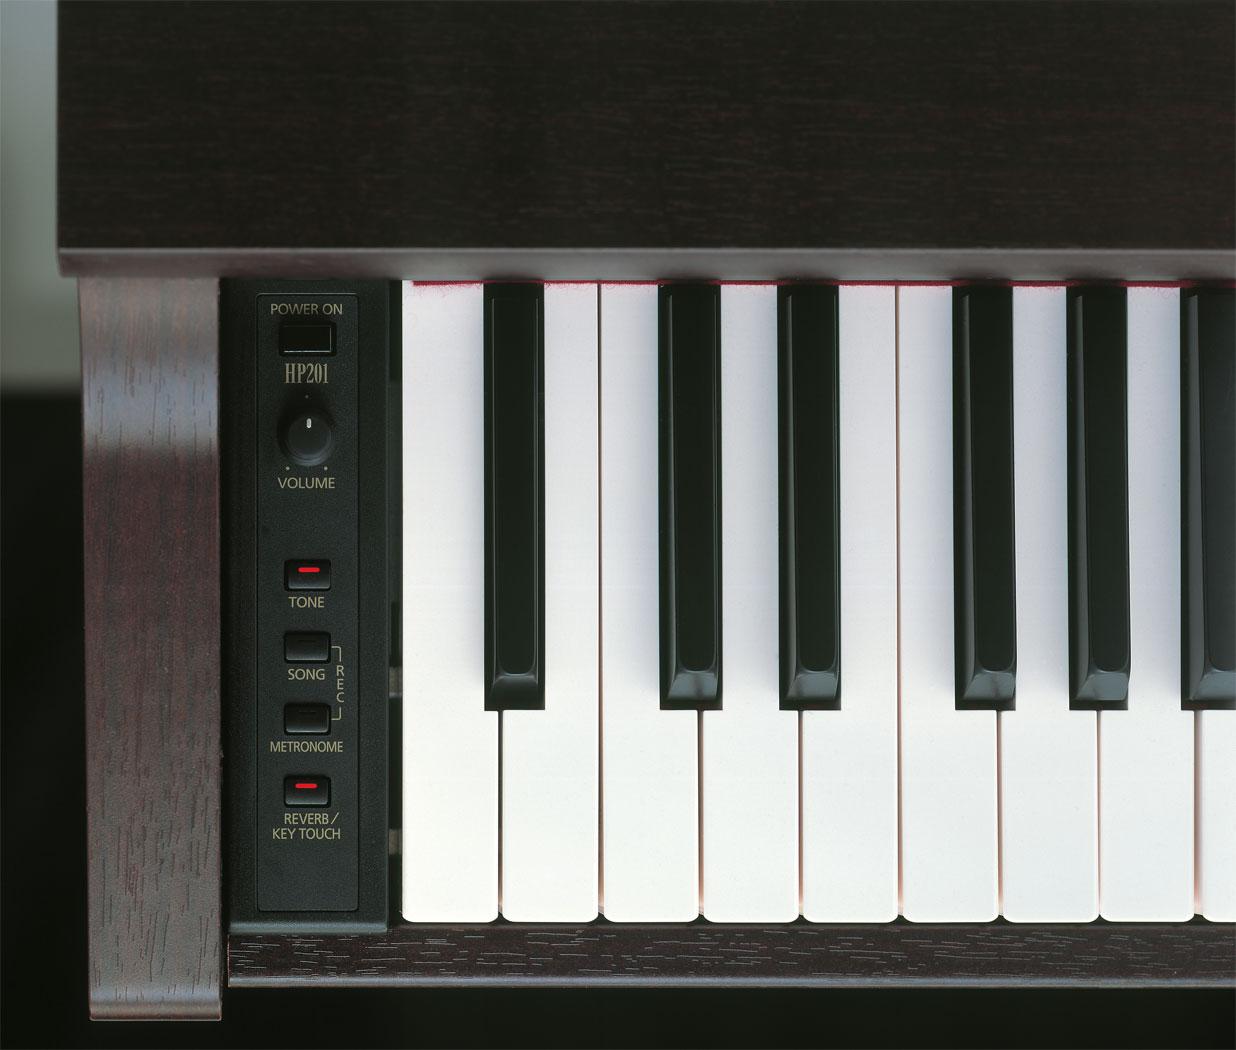 roland hp 201 digital piano. Black Bedroom Furniture Sets. Home Design Ideas